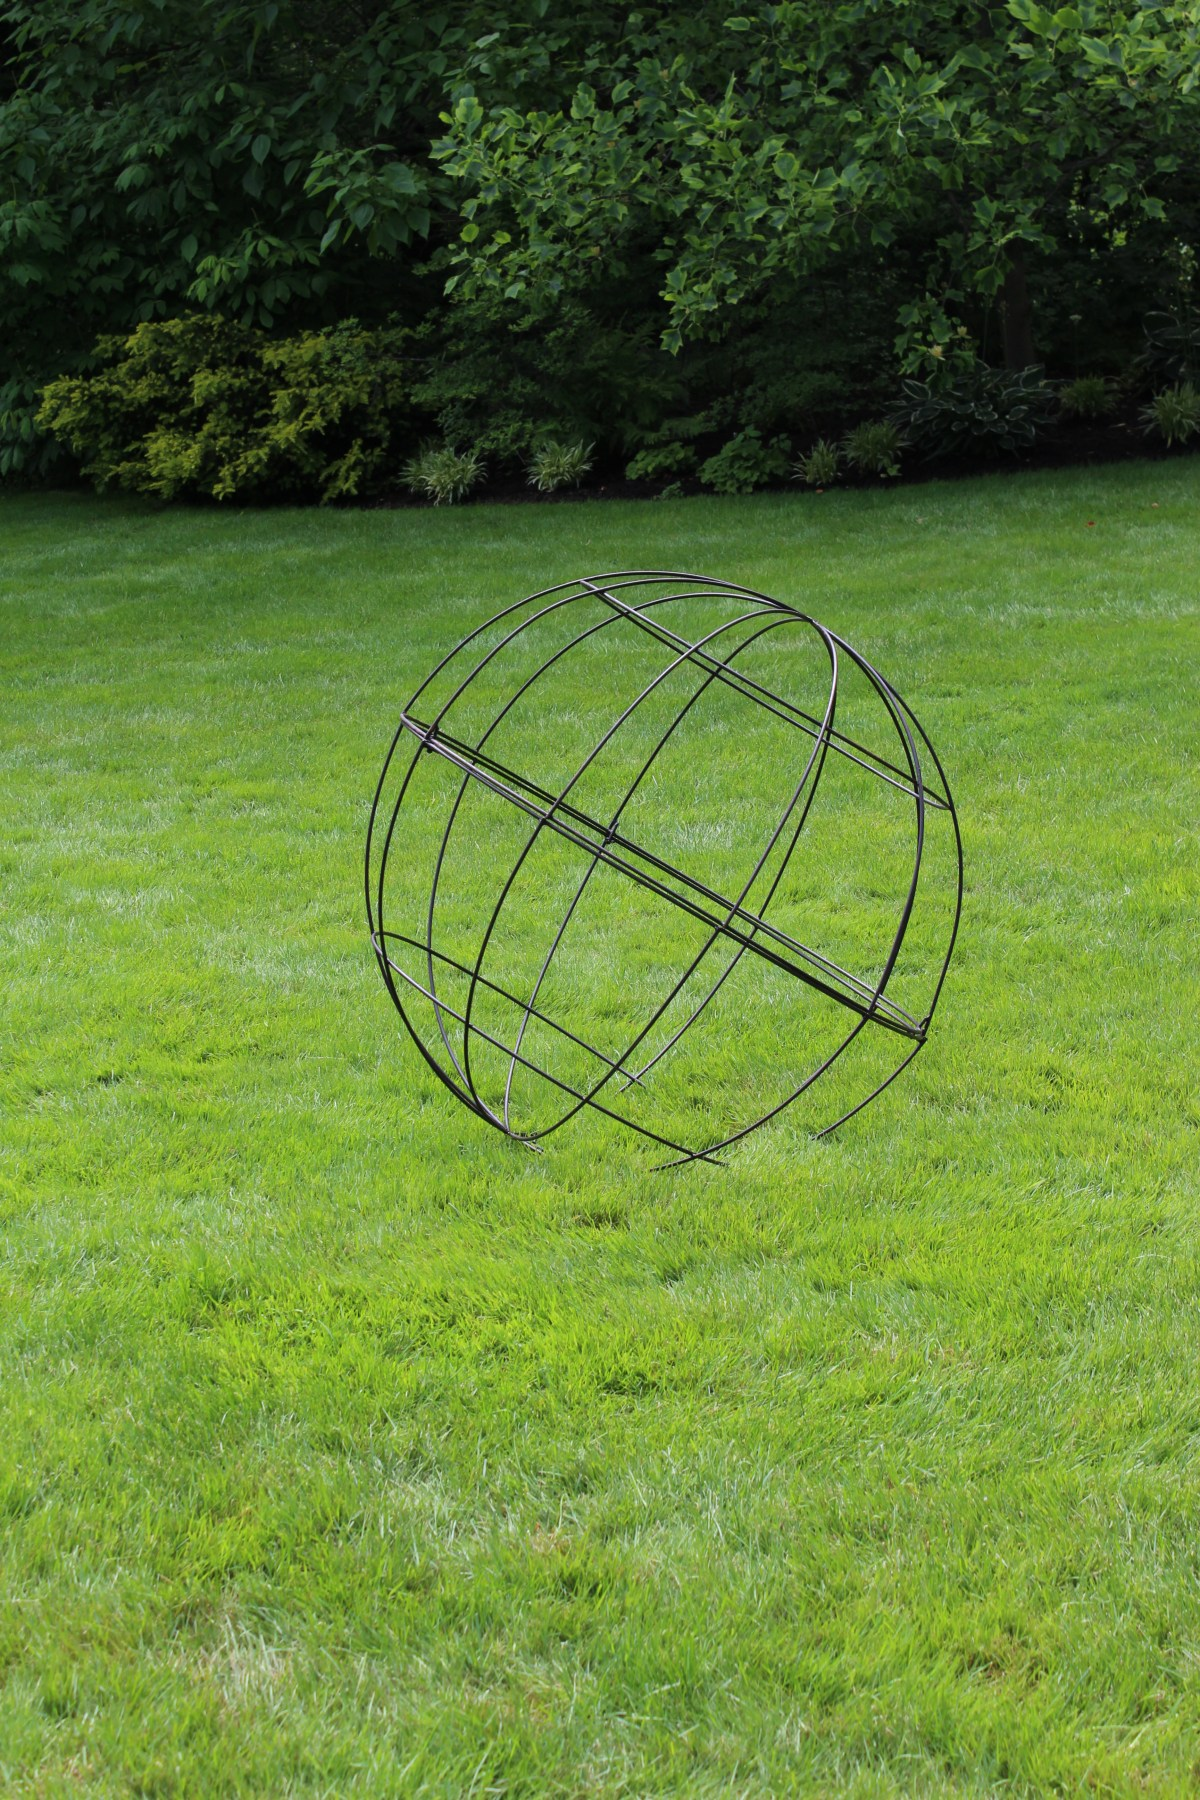 Wire Ball 39%22 in lawn_Lexington Field + Garden Tour 2013